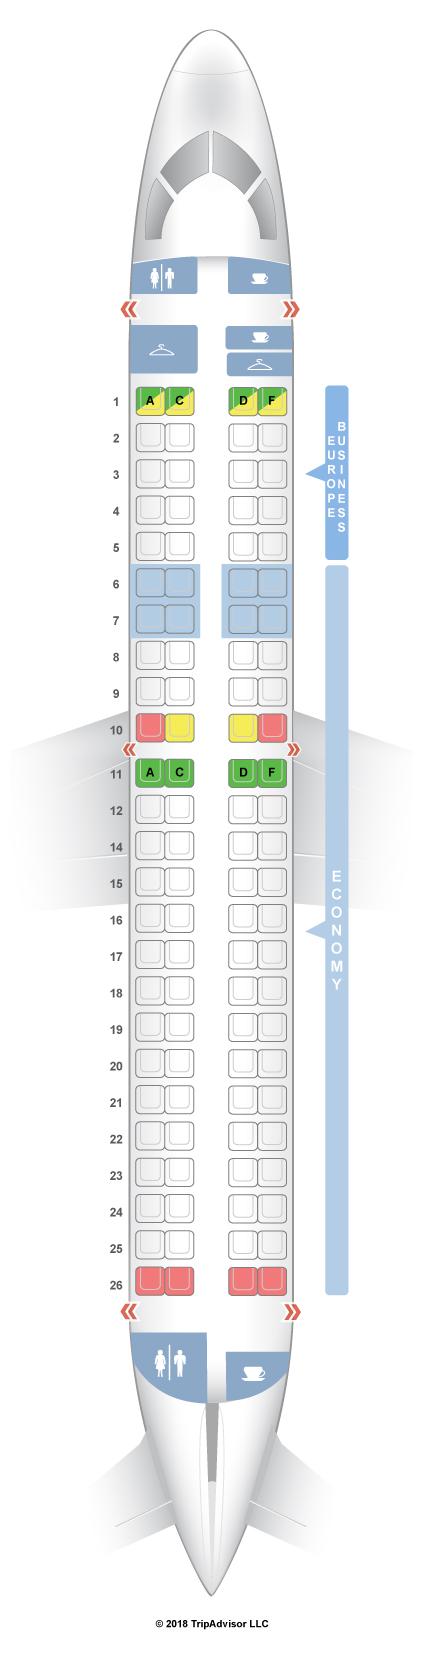 Seatguru Seat Map Klm Embraer E 190